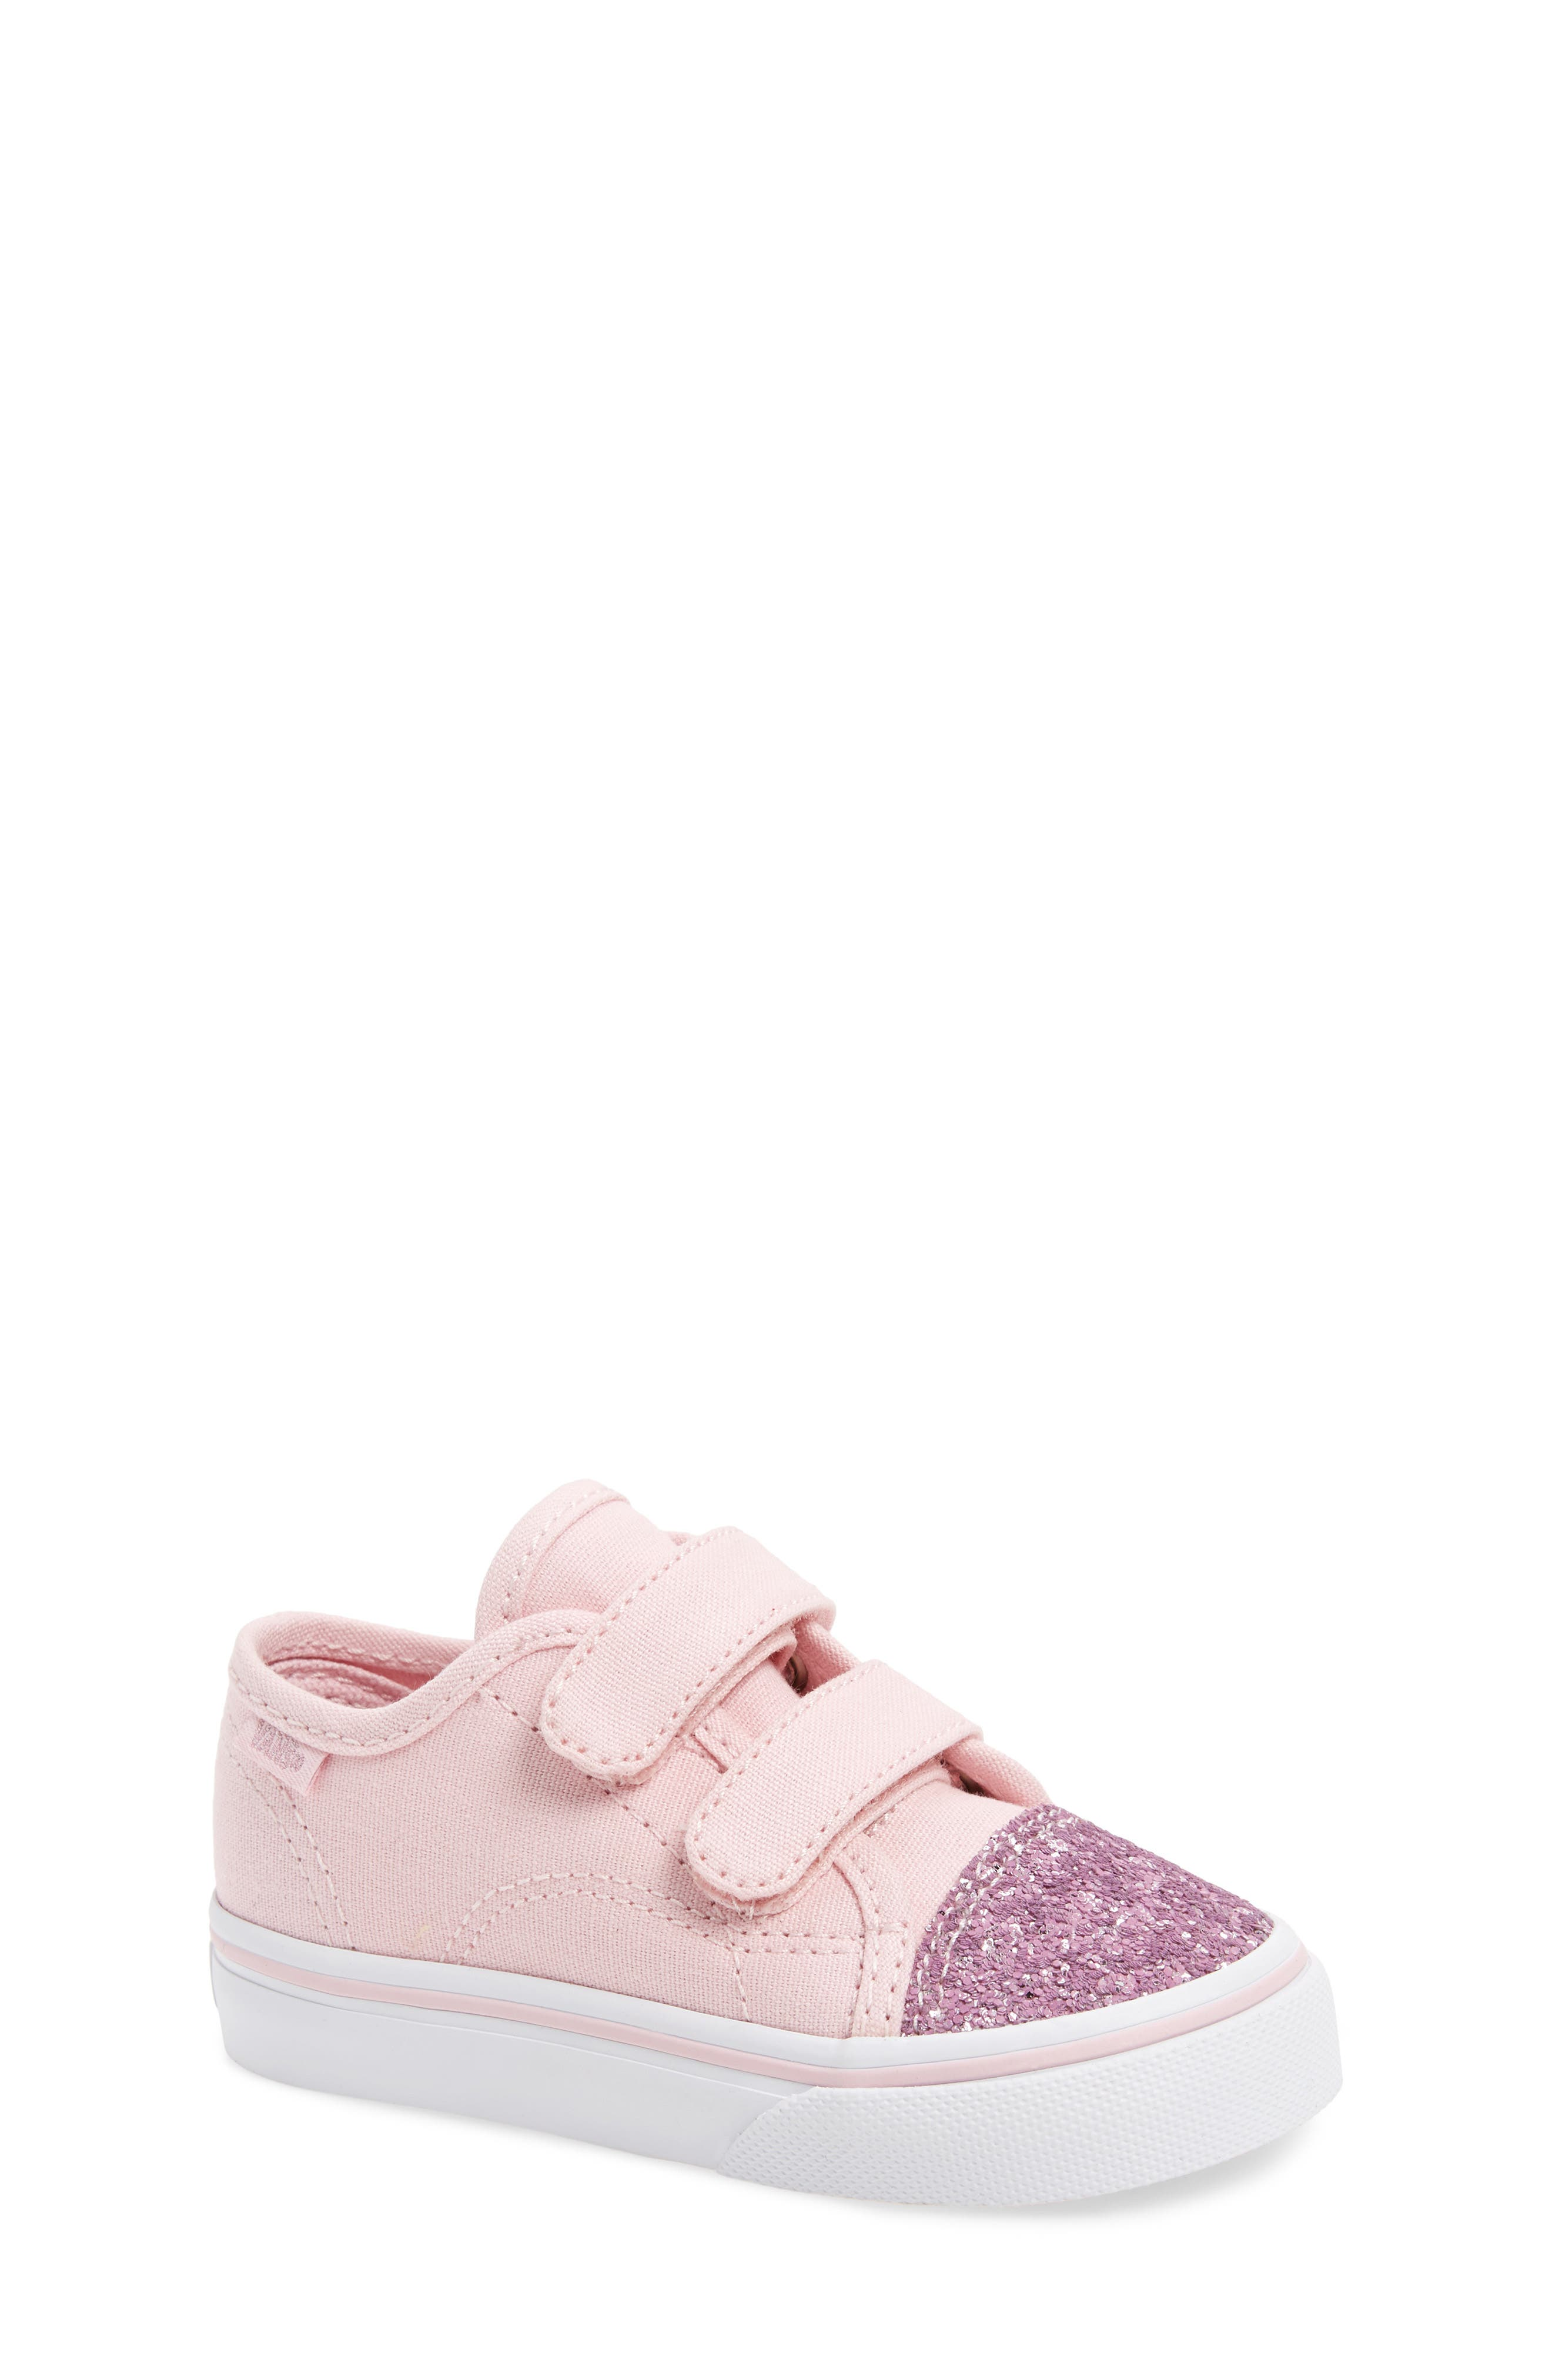 Glitter Toe Style 23 V Sneaker,                         Main,                         color, Glitter Chalk Pink/ True White